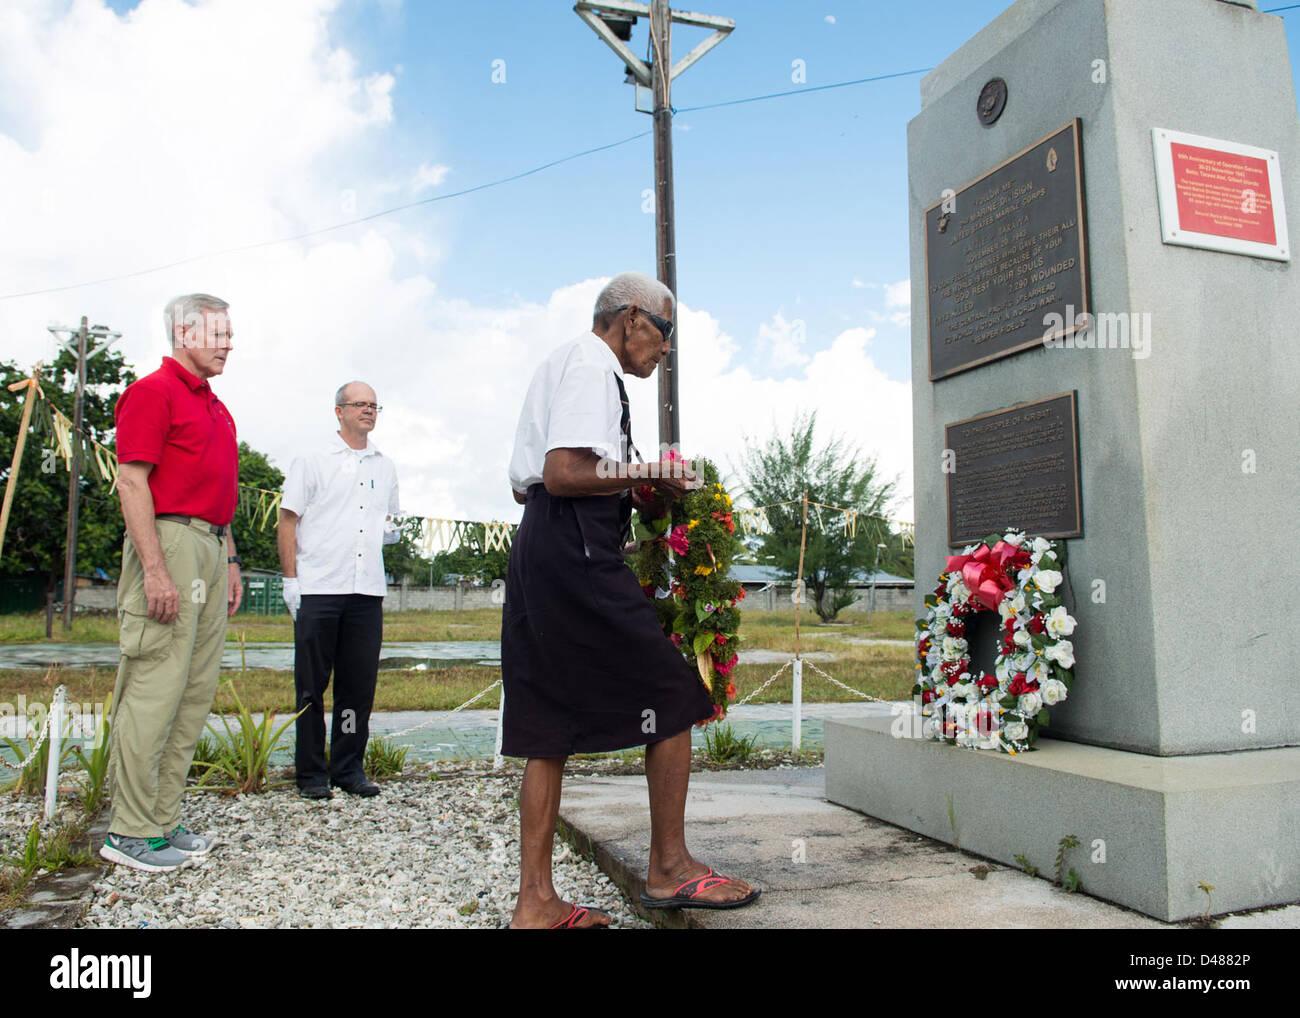 SECNAV visits the site of the Battle of Tarawa. - Stock Image